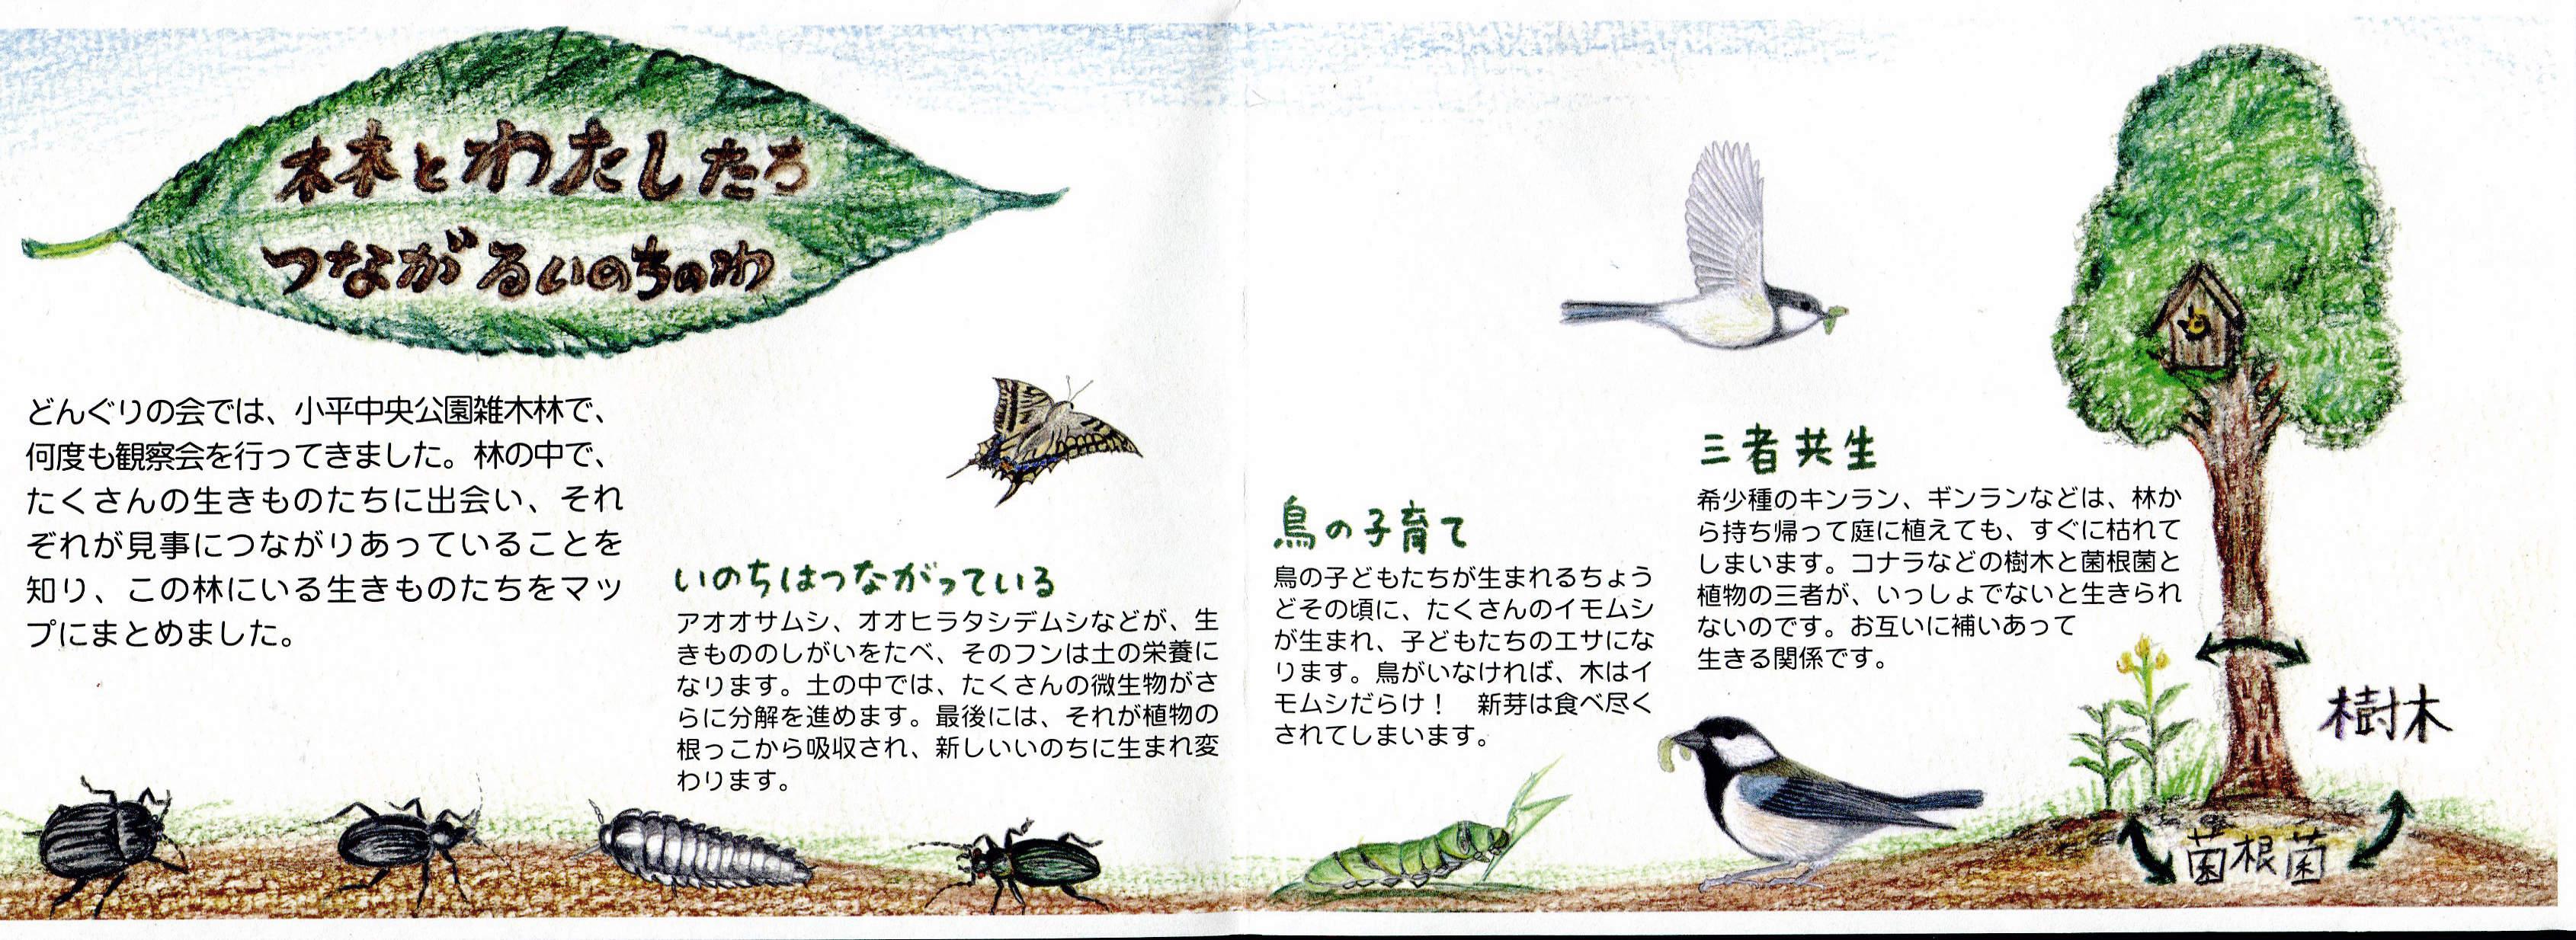 ikimonomap2012_2